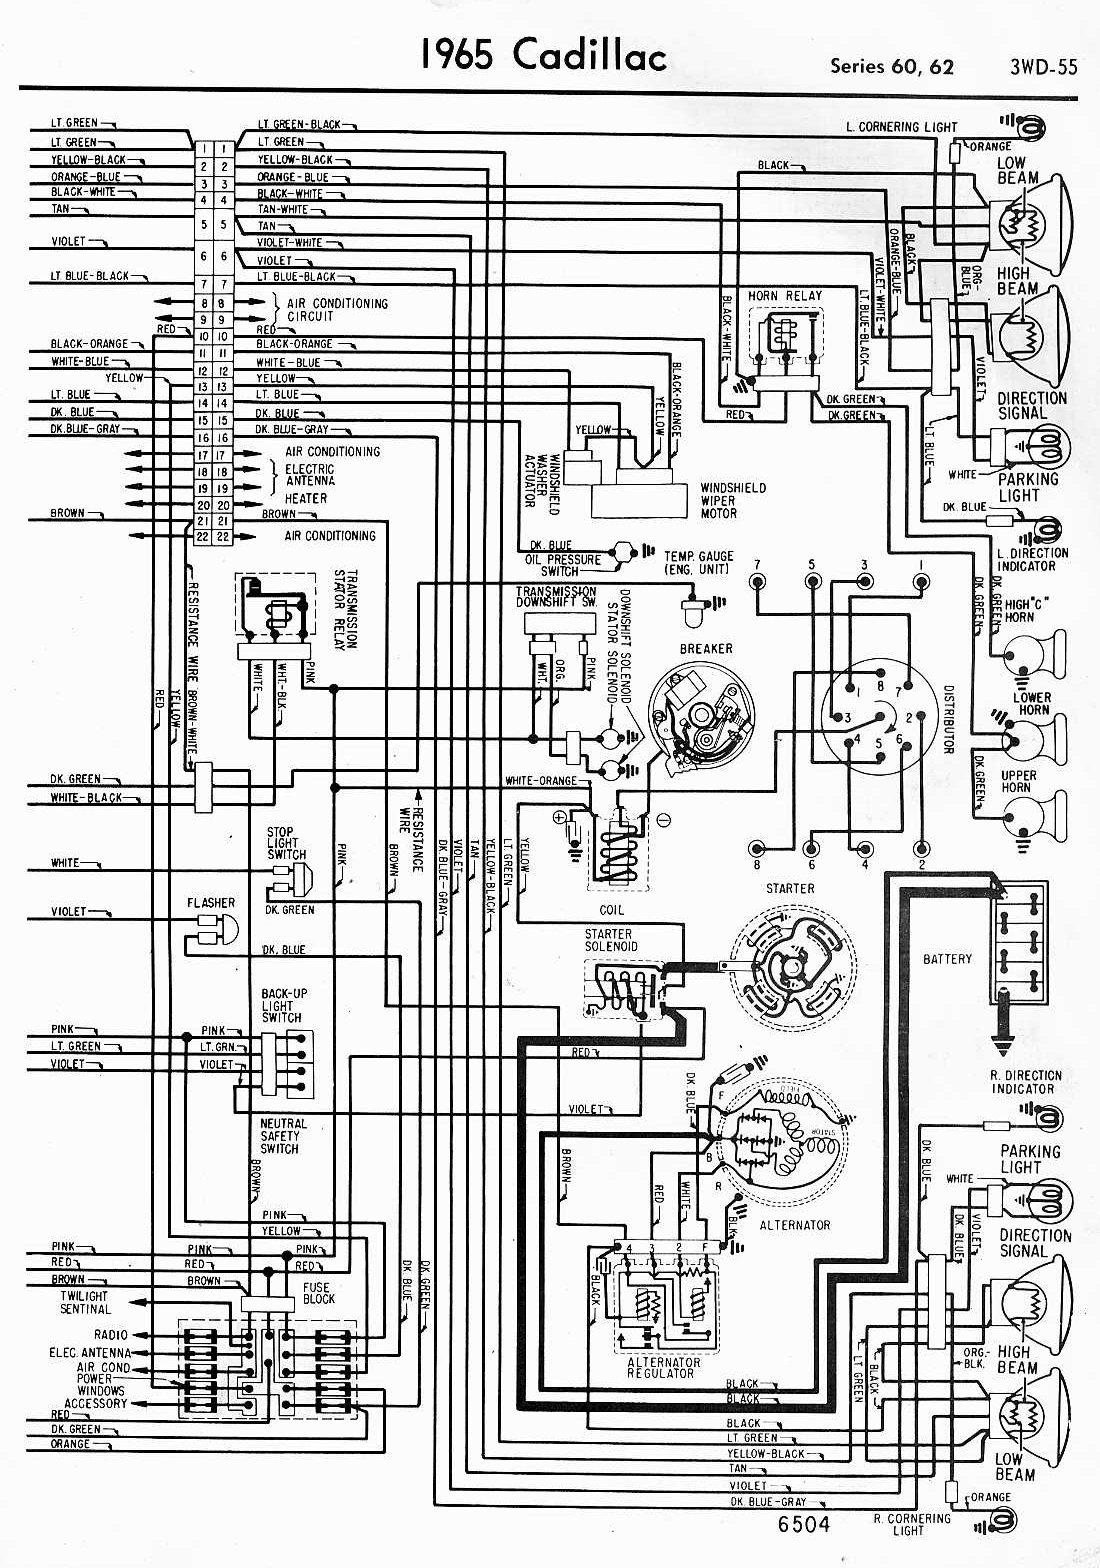 1957 Thunderbird Power Seat Wiring Diagram Library 1965 Cadillac